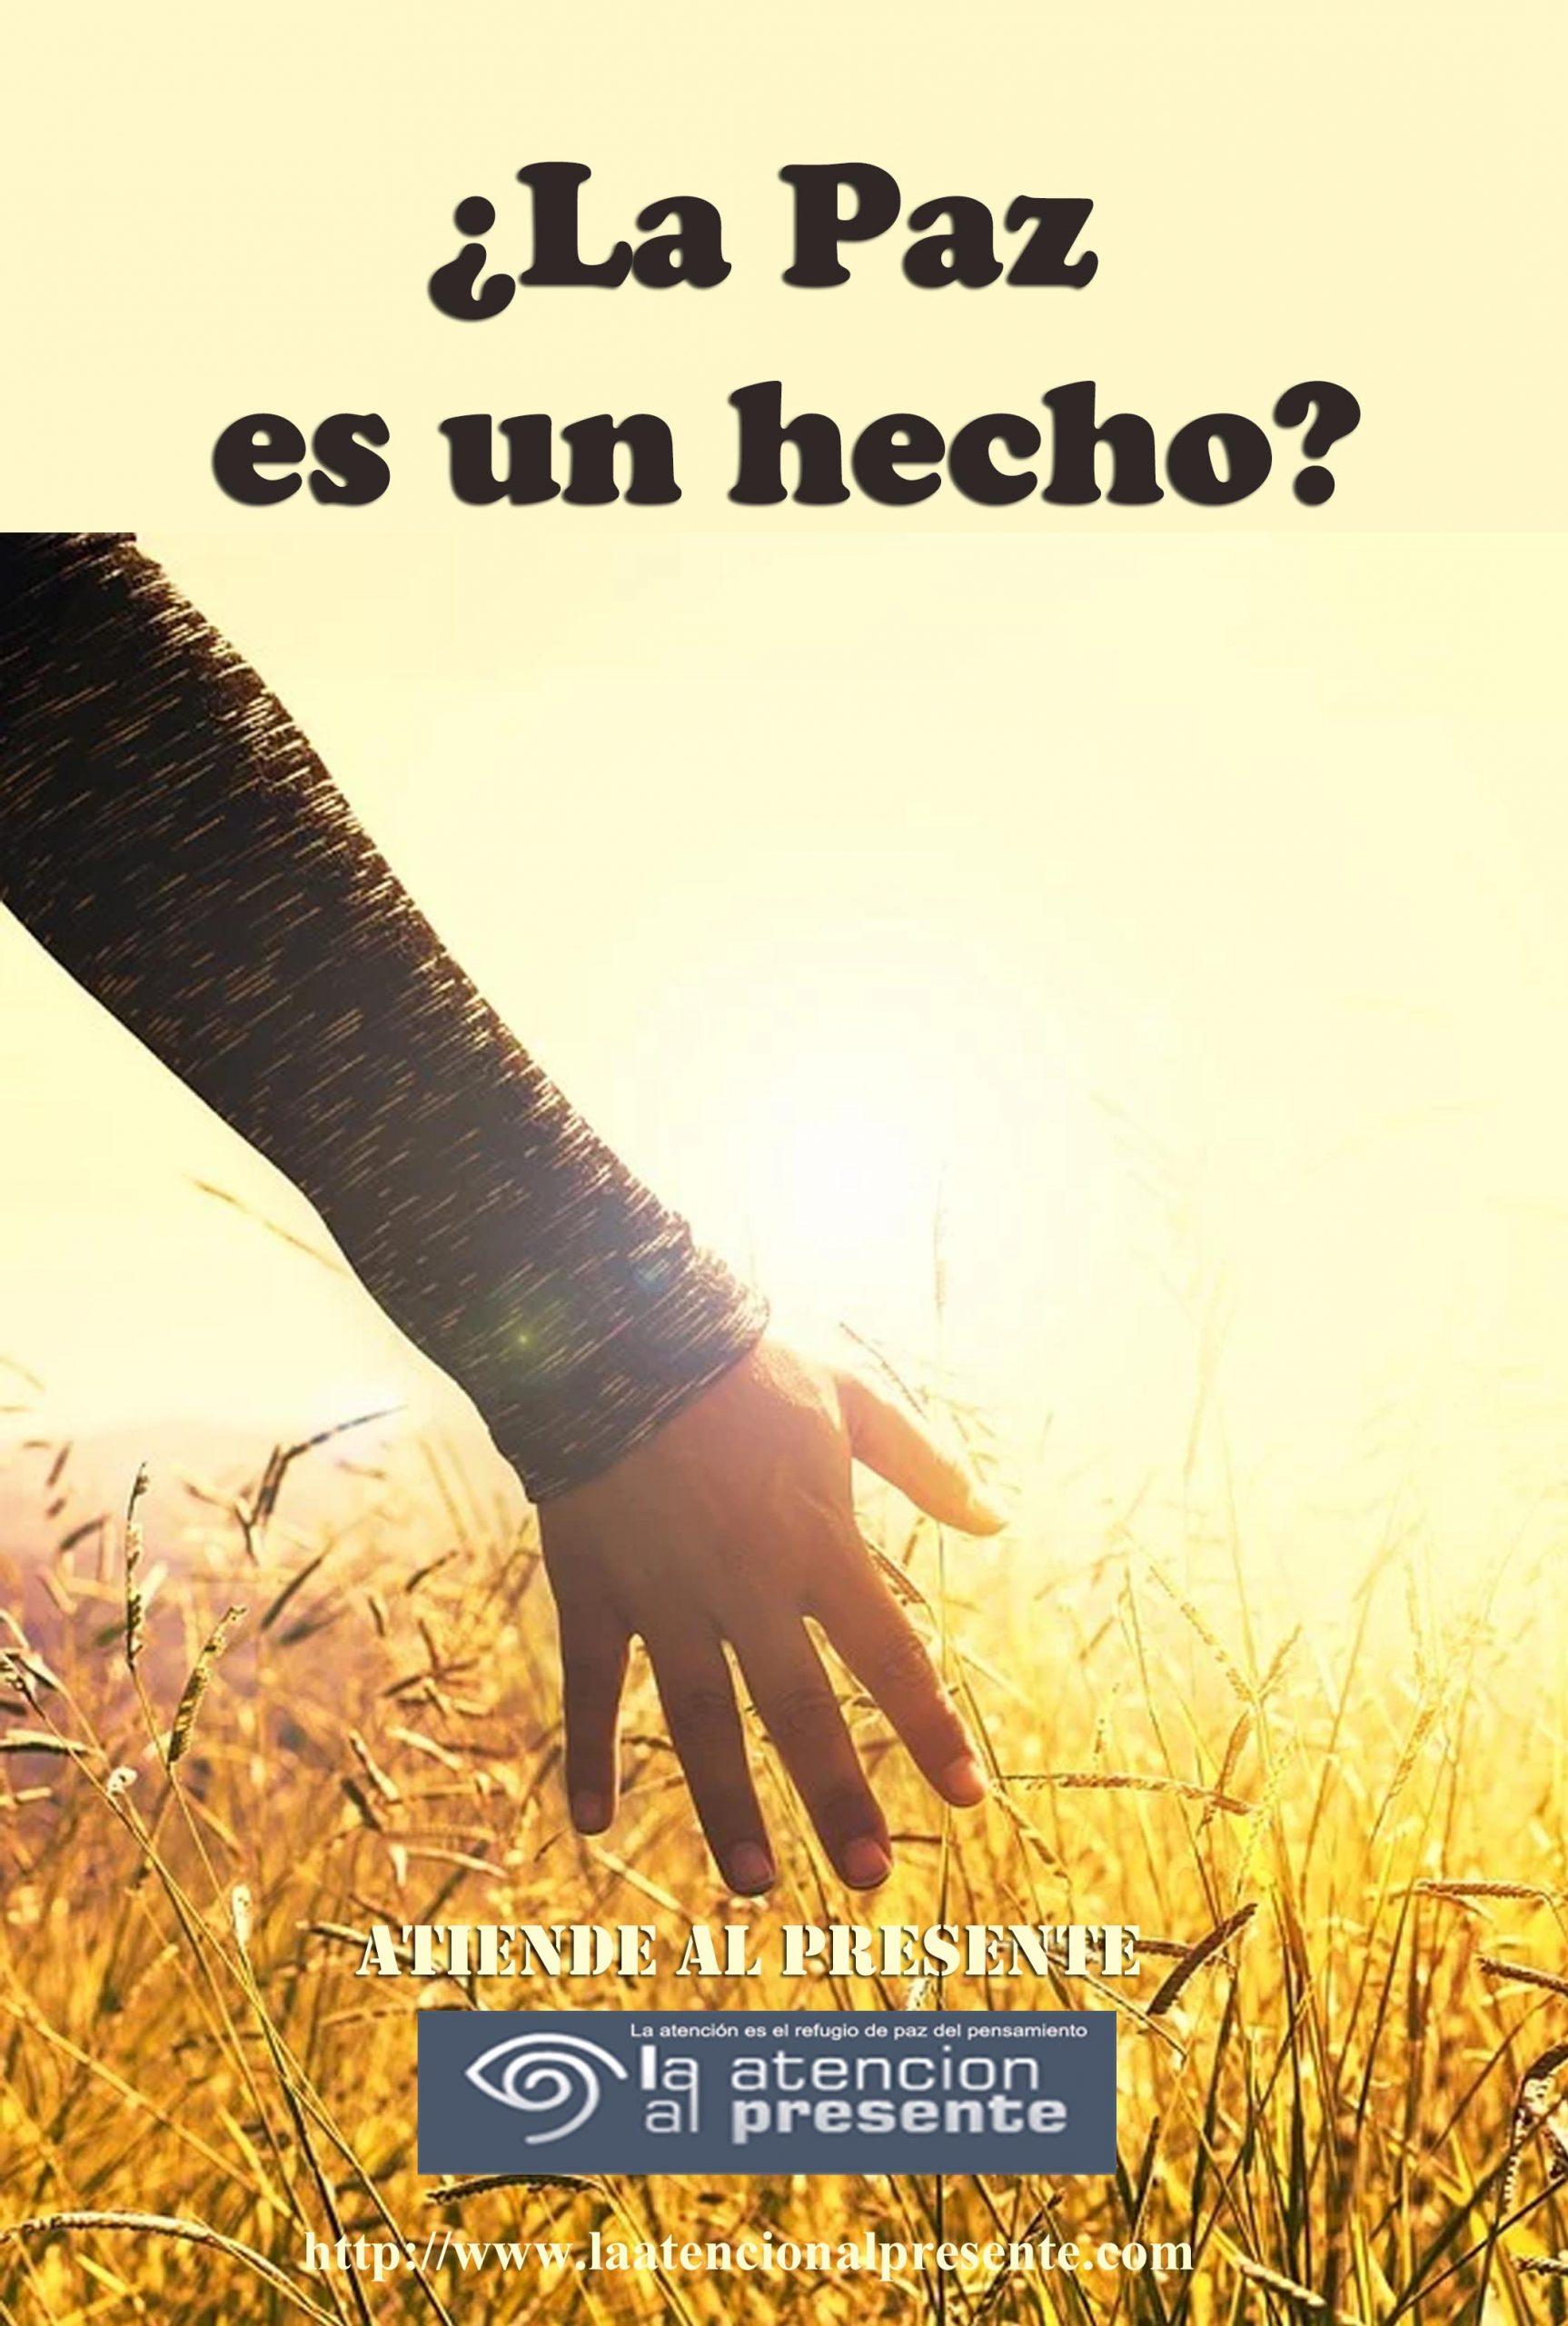 12 de set E La Paz es un hecho min scaled